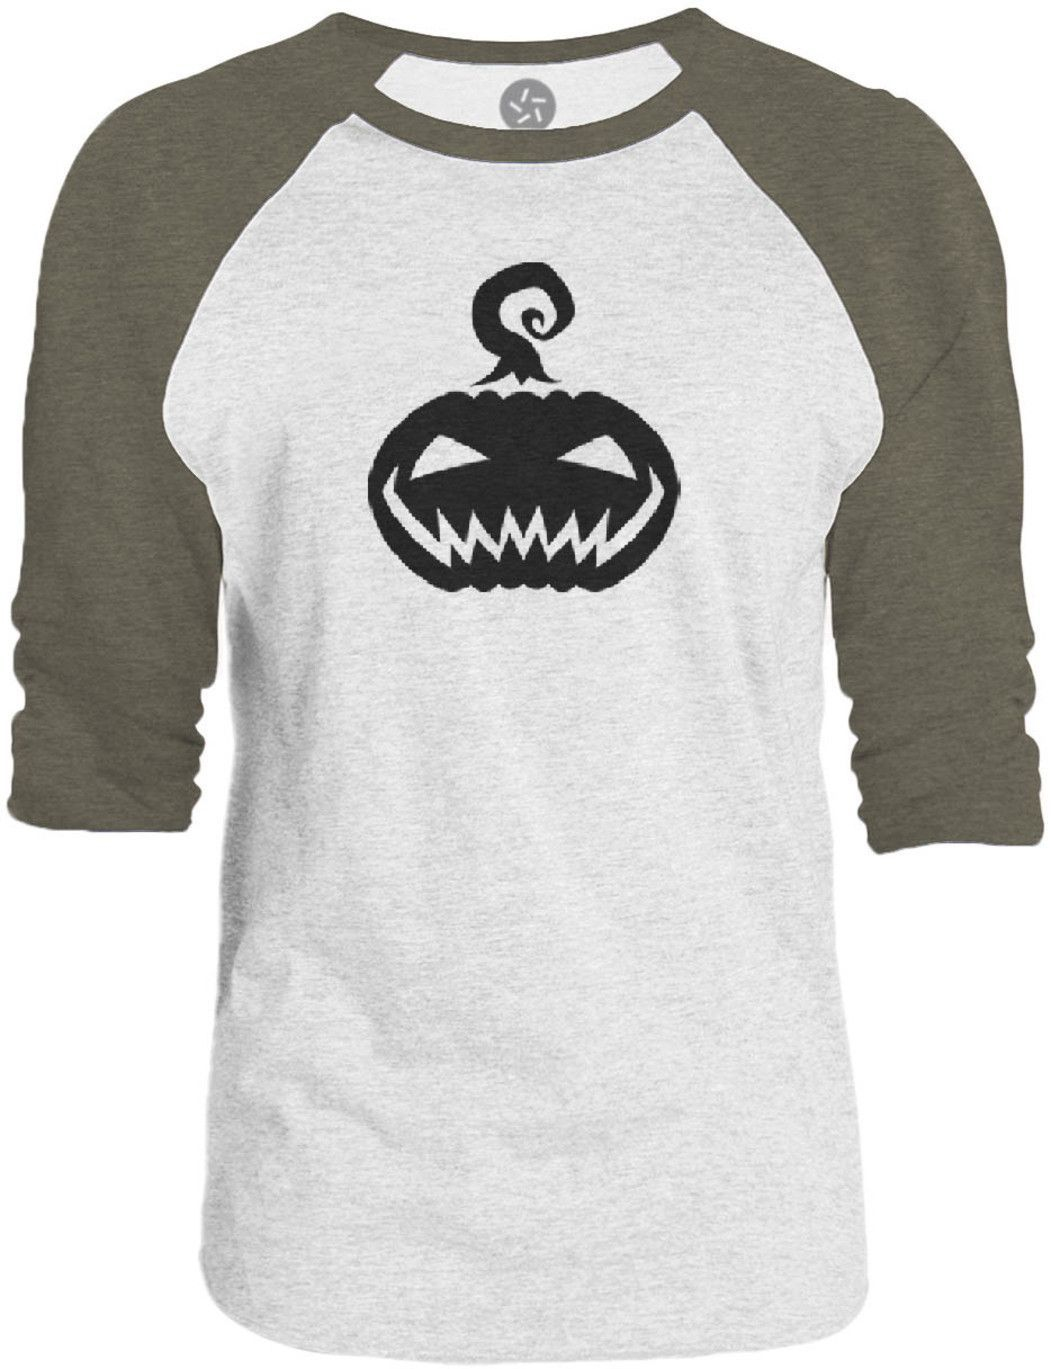 Big Texas Jack OLantern (Black) 3/4-Sleeve Raglan Baseball T-Shirt